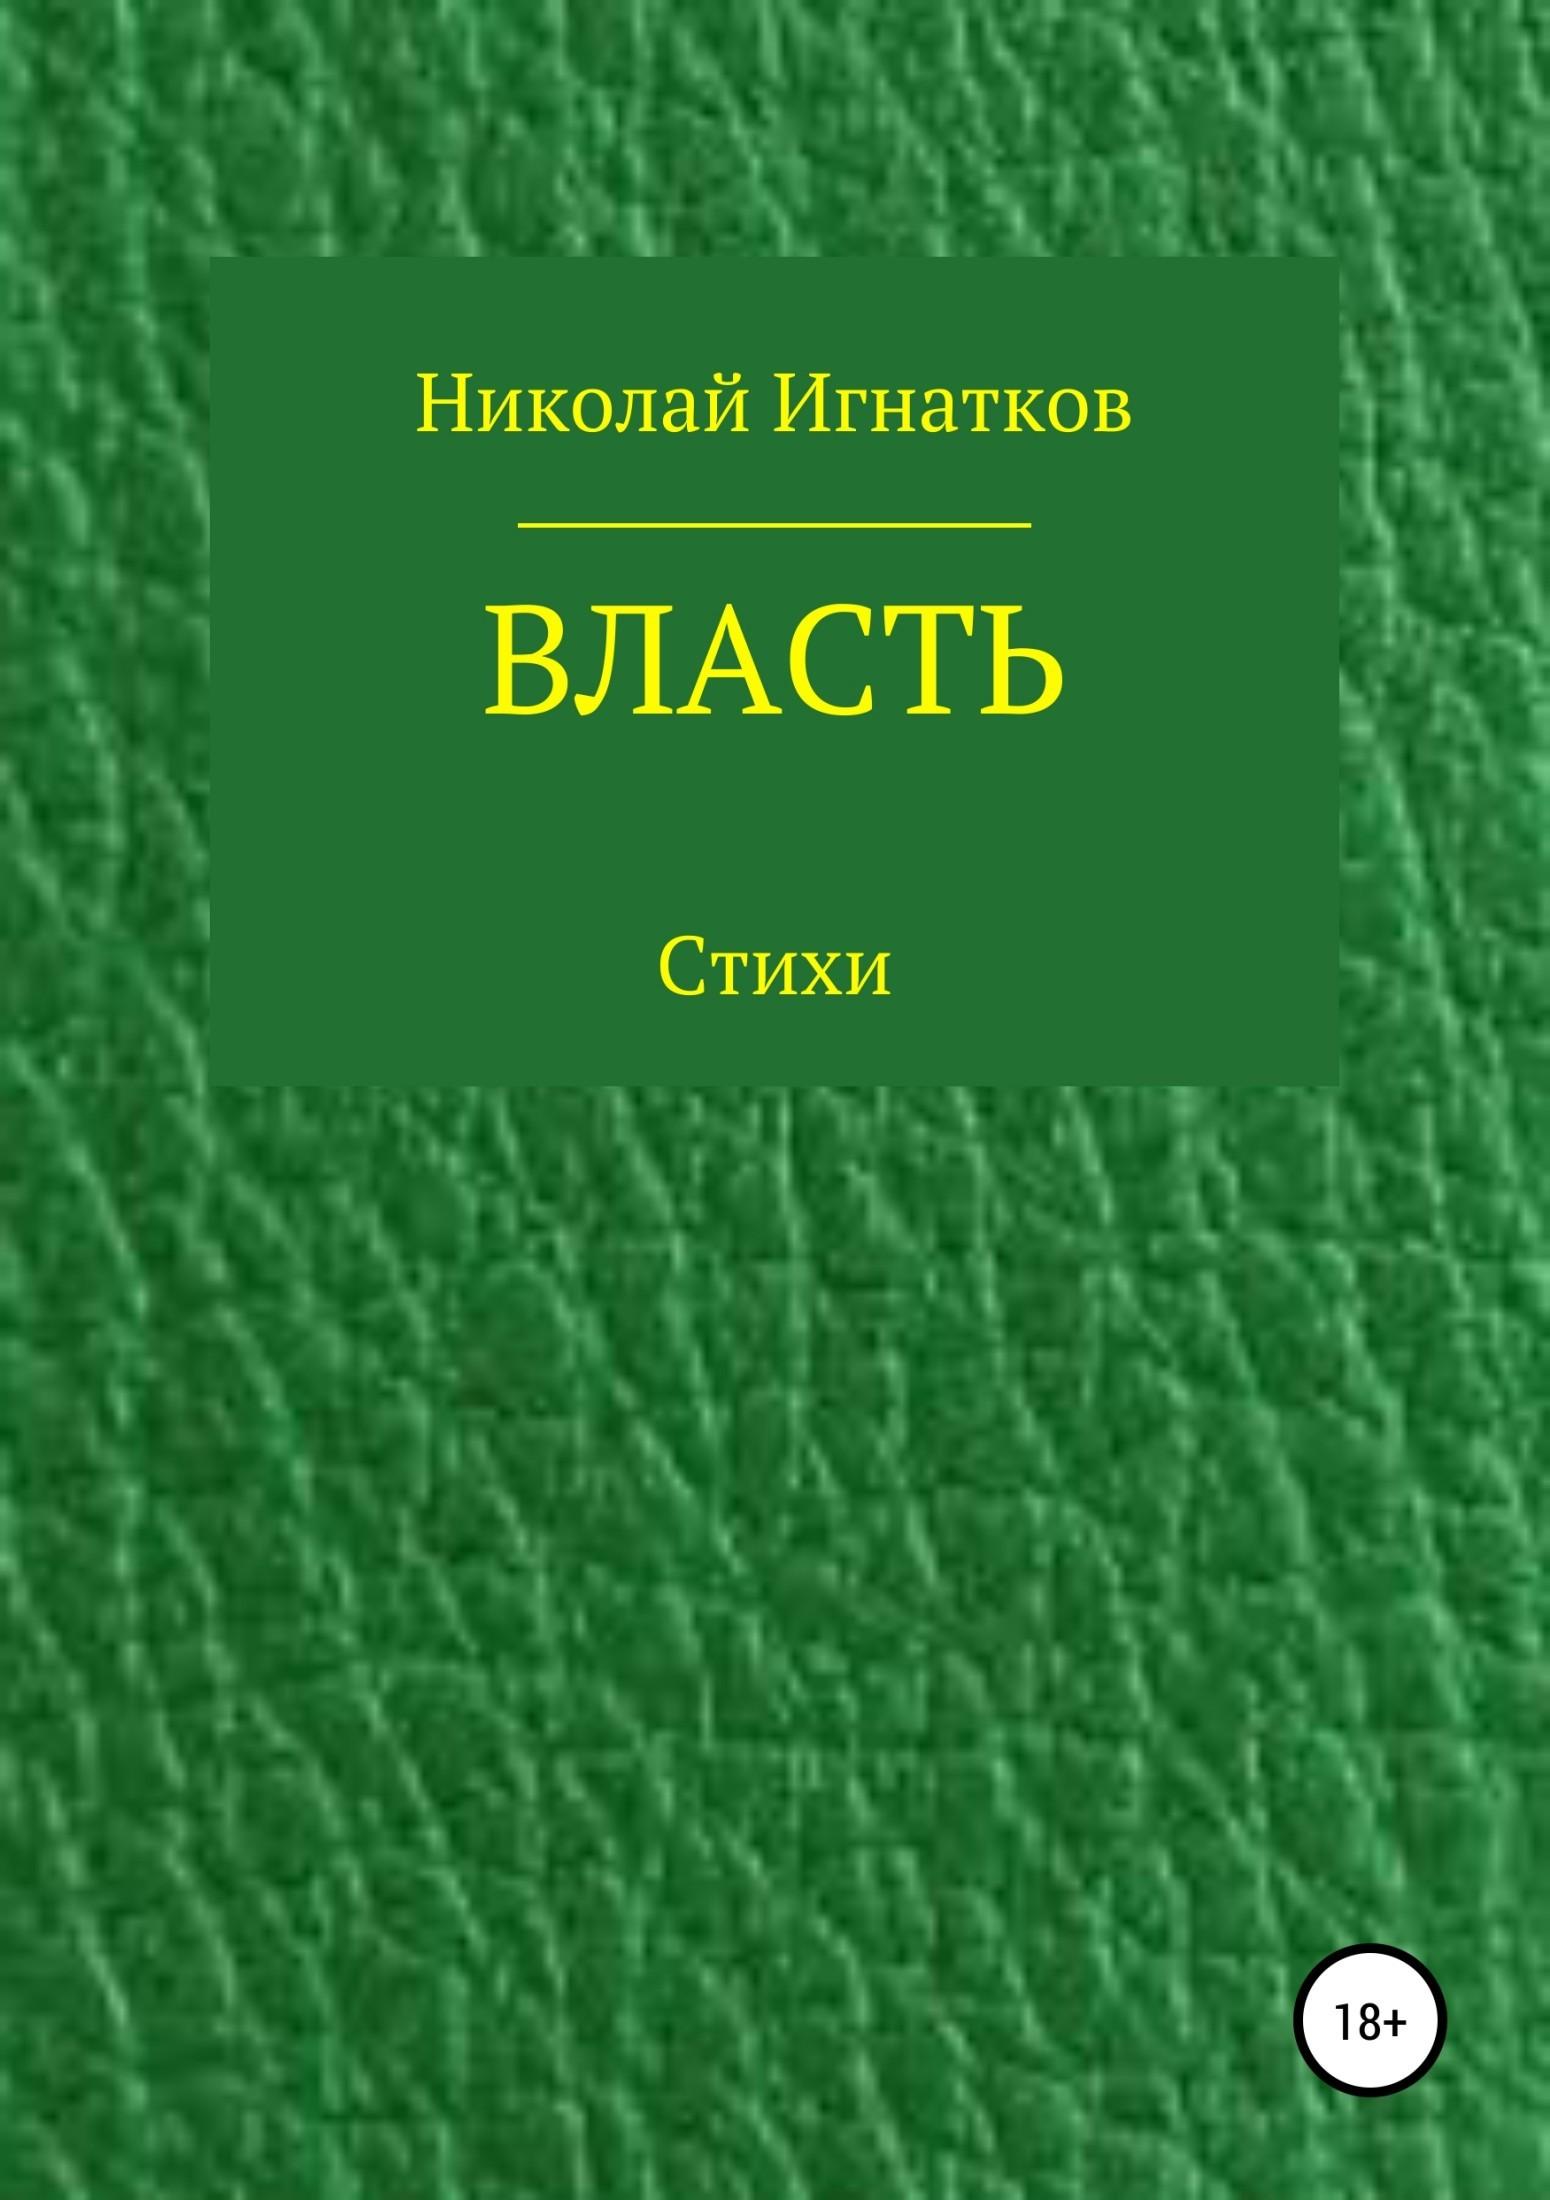 Николай Викторович Игнатков Власть. Книга стихотворений цена